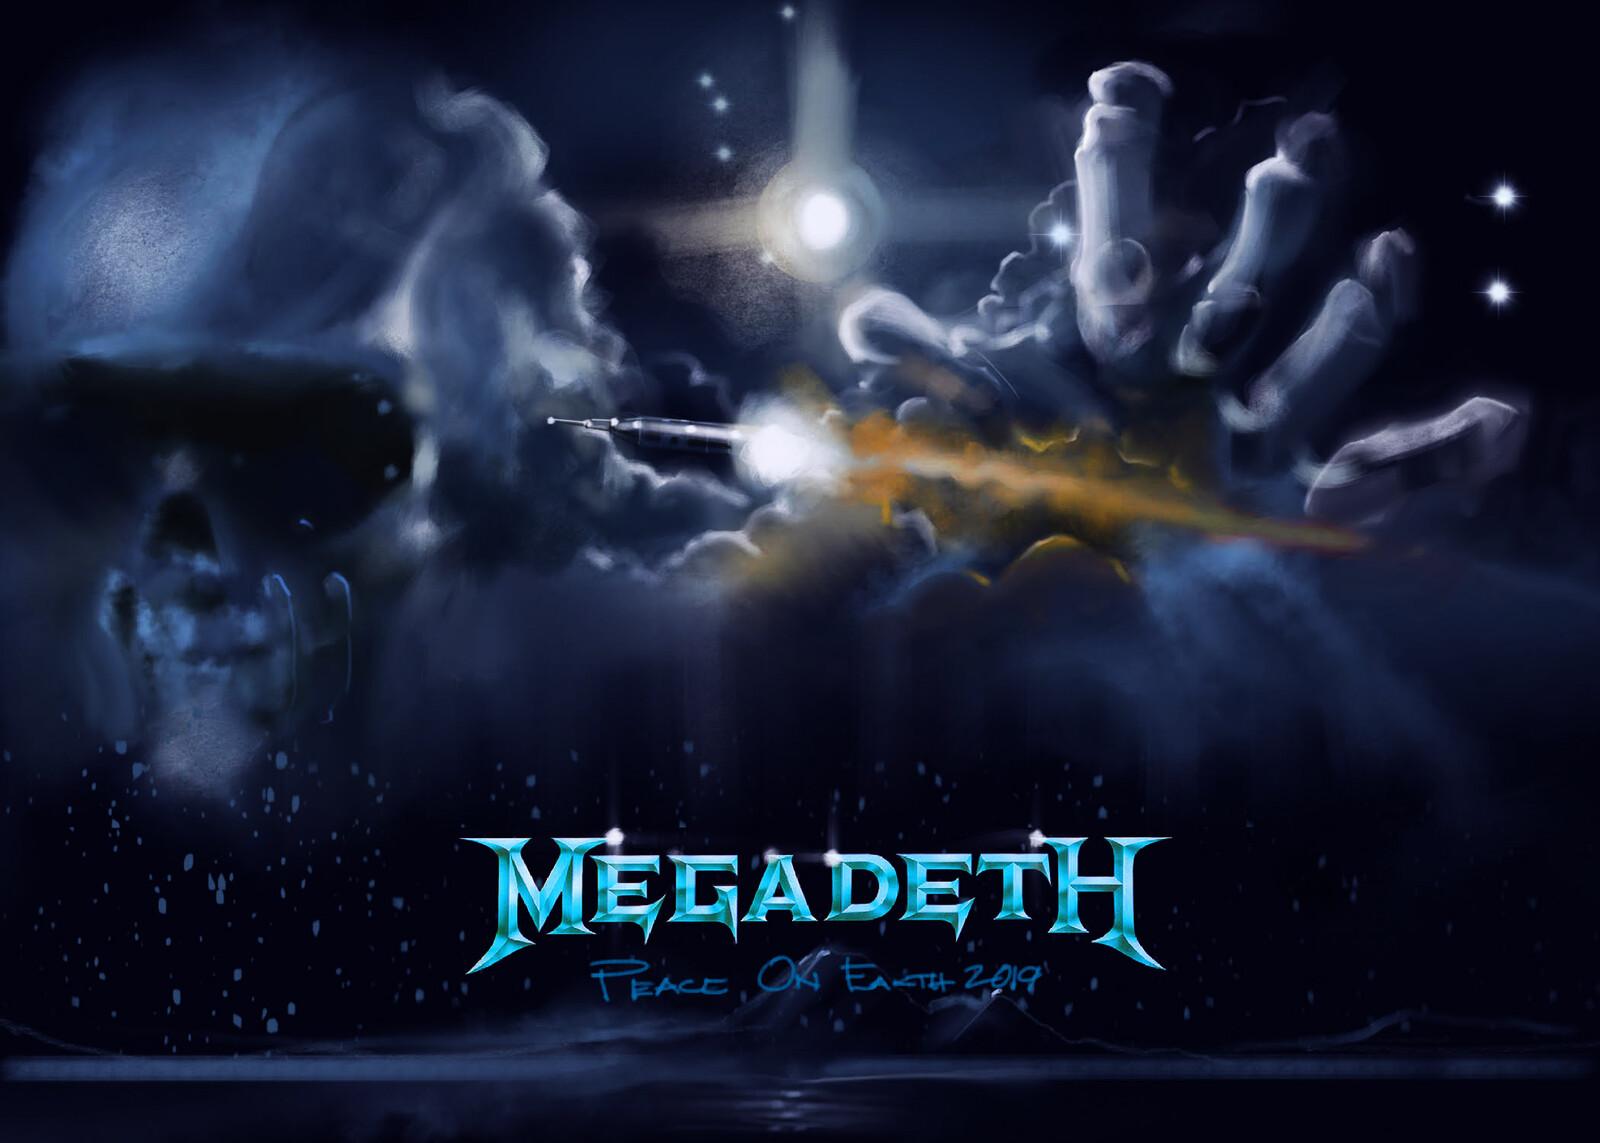 Peace on Earth_Megadeth Holiday Card 2019_3